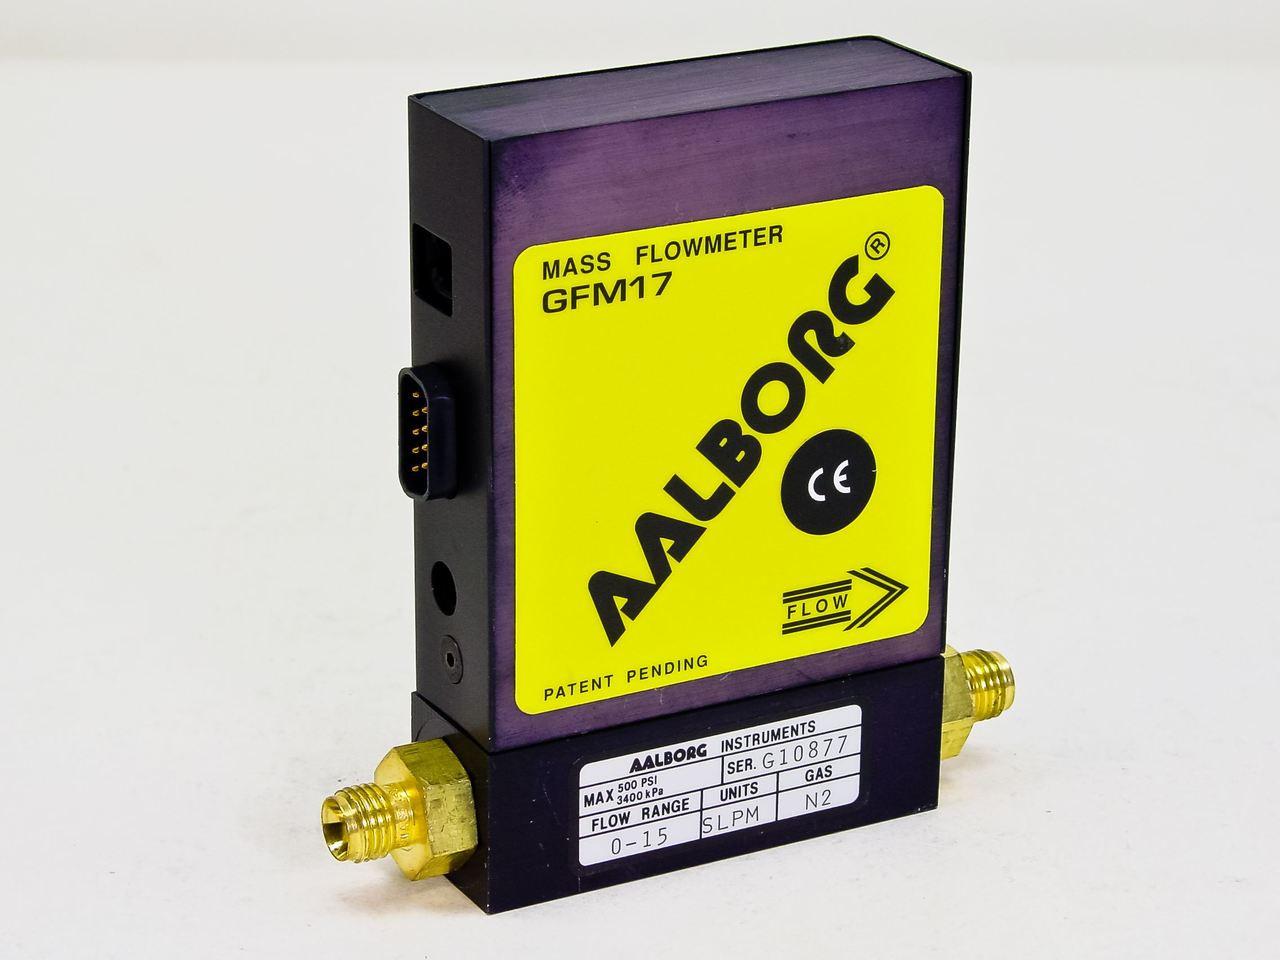 aalborg mass flow controller manual